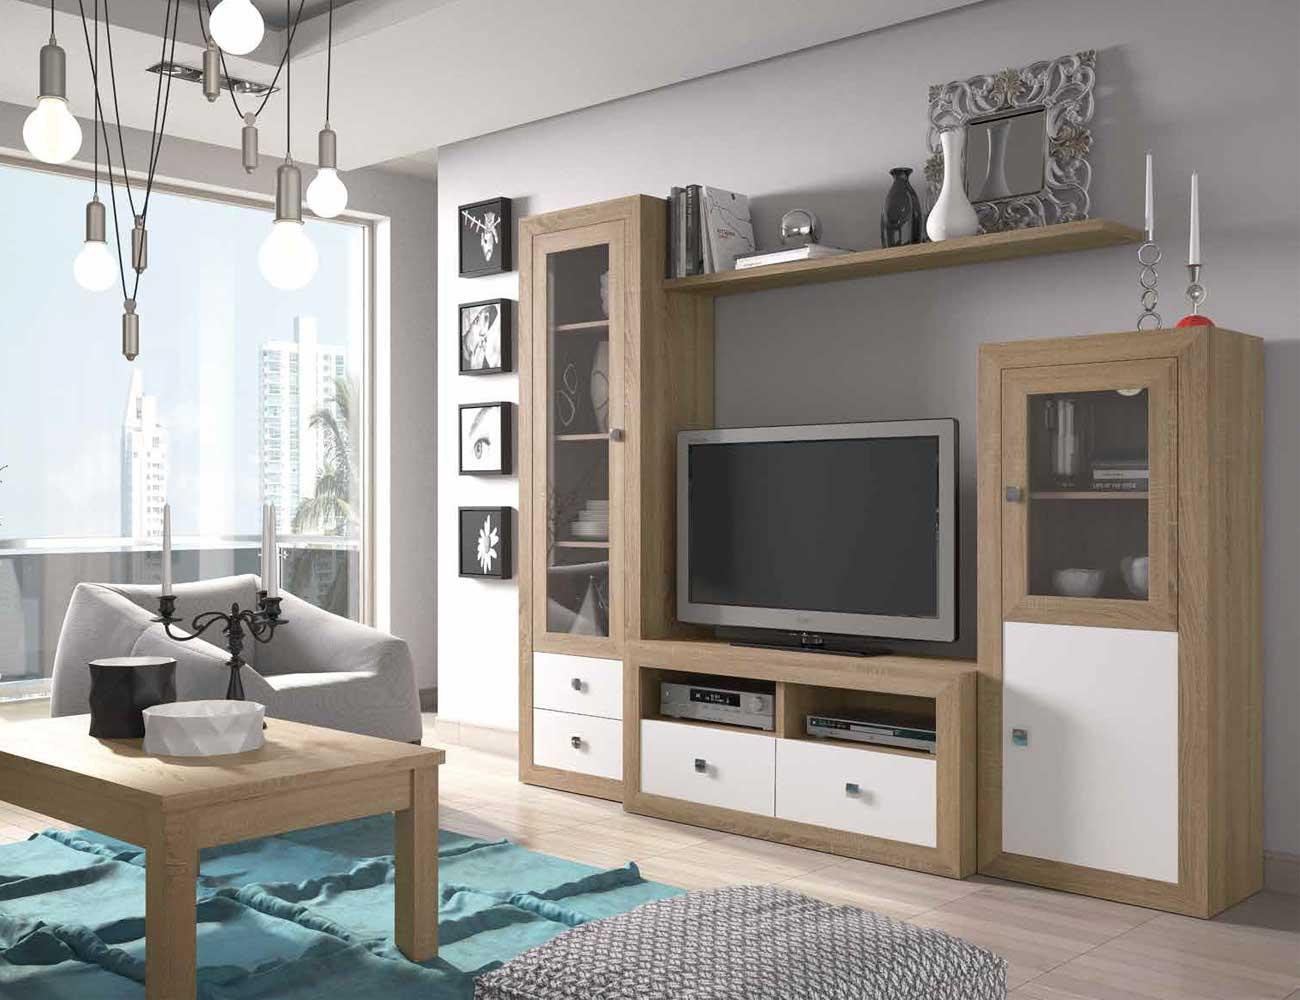 Mueble salon colonial cambrian blanco 22